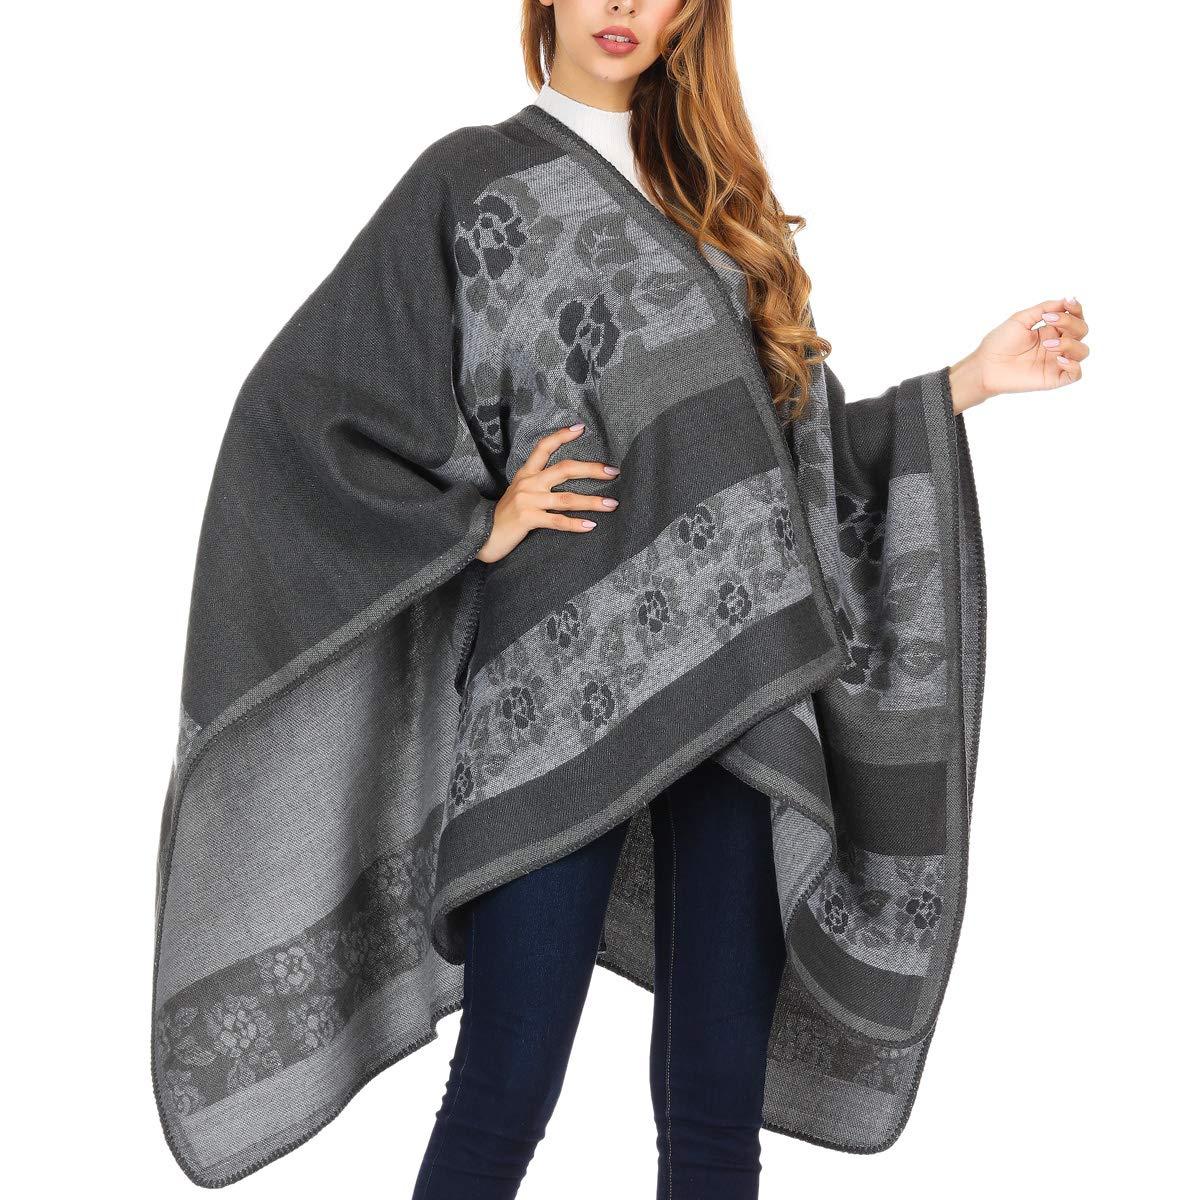 DoFiyeng Women Poncho Shawl Poncho Cape Cardigan Open Front Elegant Cape Wrap Shawl Wrap(White gray pattern) by DoFiyeng